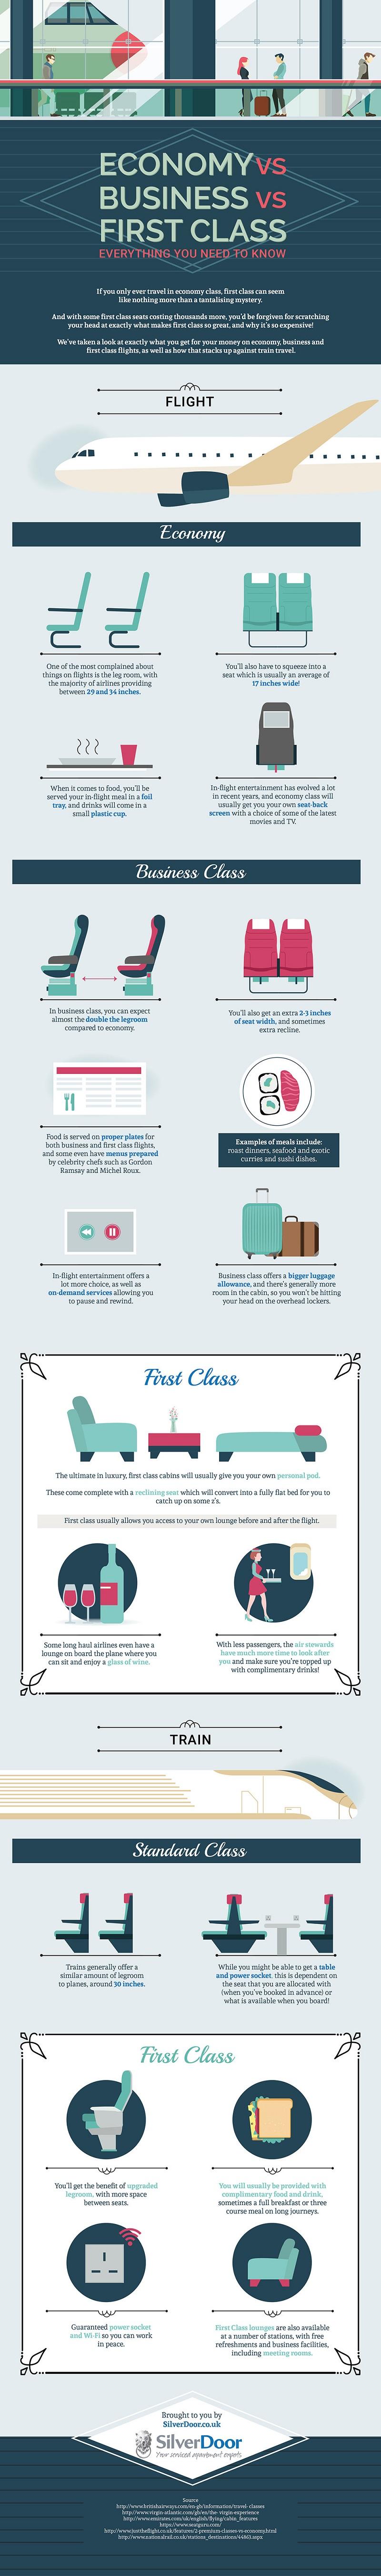 Economy vs Business vs First Class